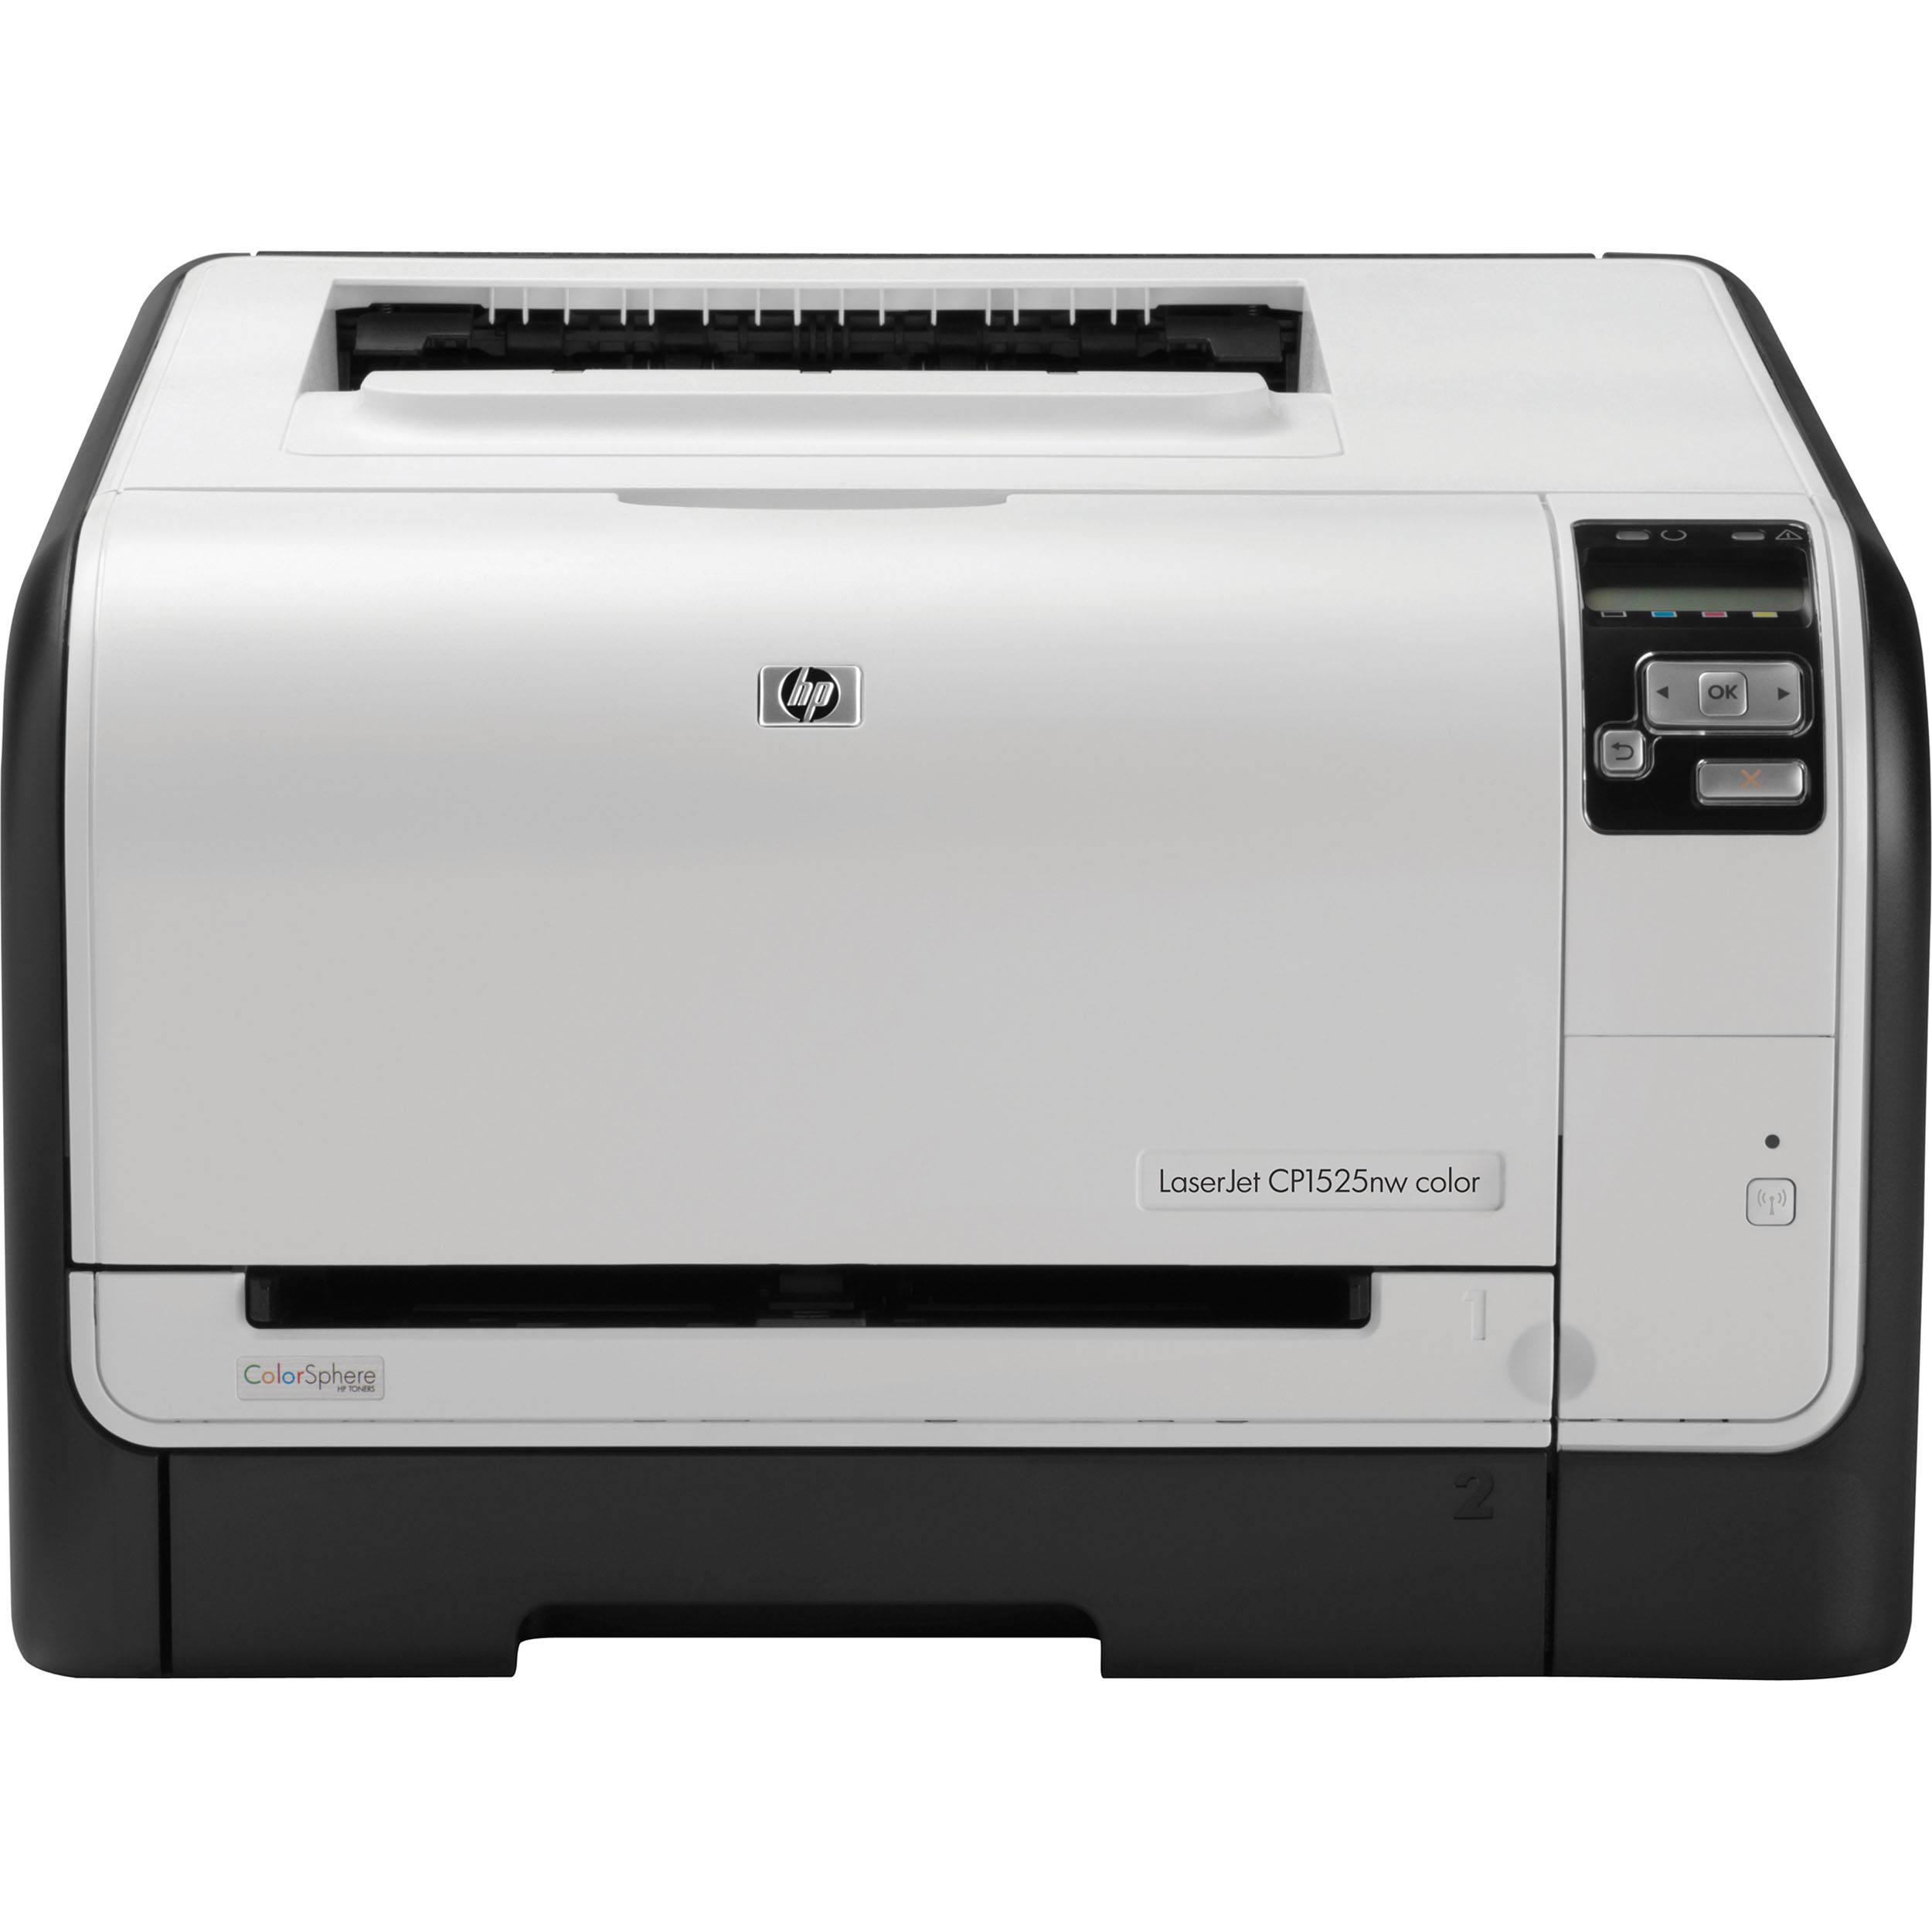 HP LaserJet Pro CP1525nw Color Laser E Printer CE875ABGJ BampH